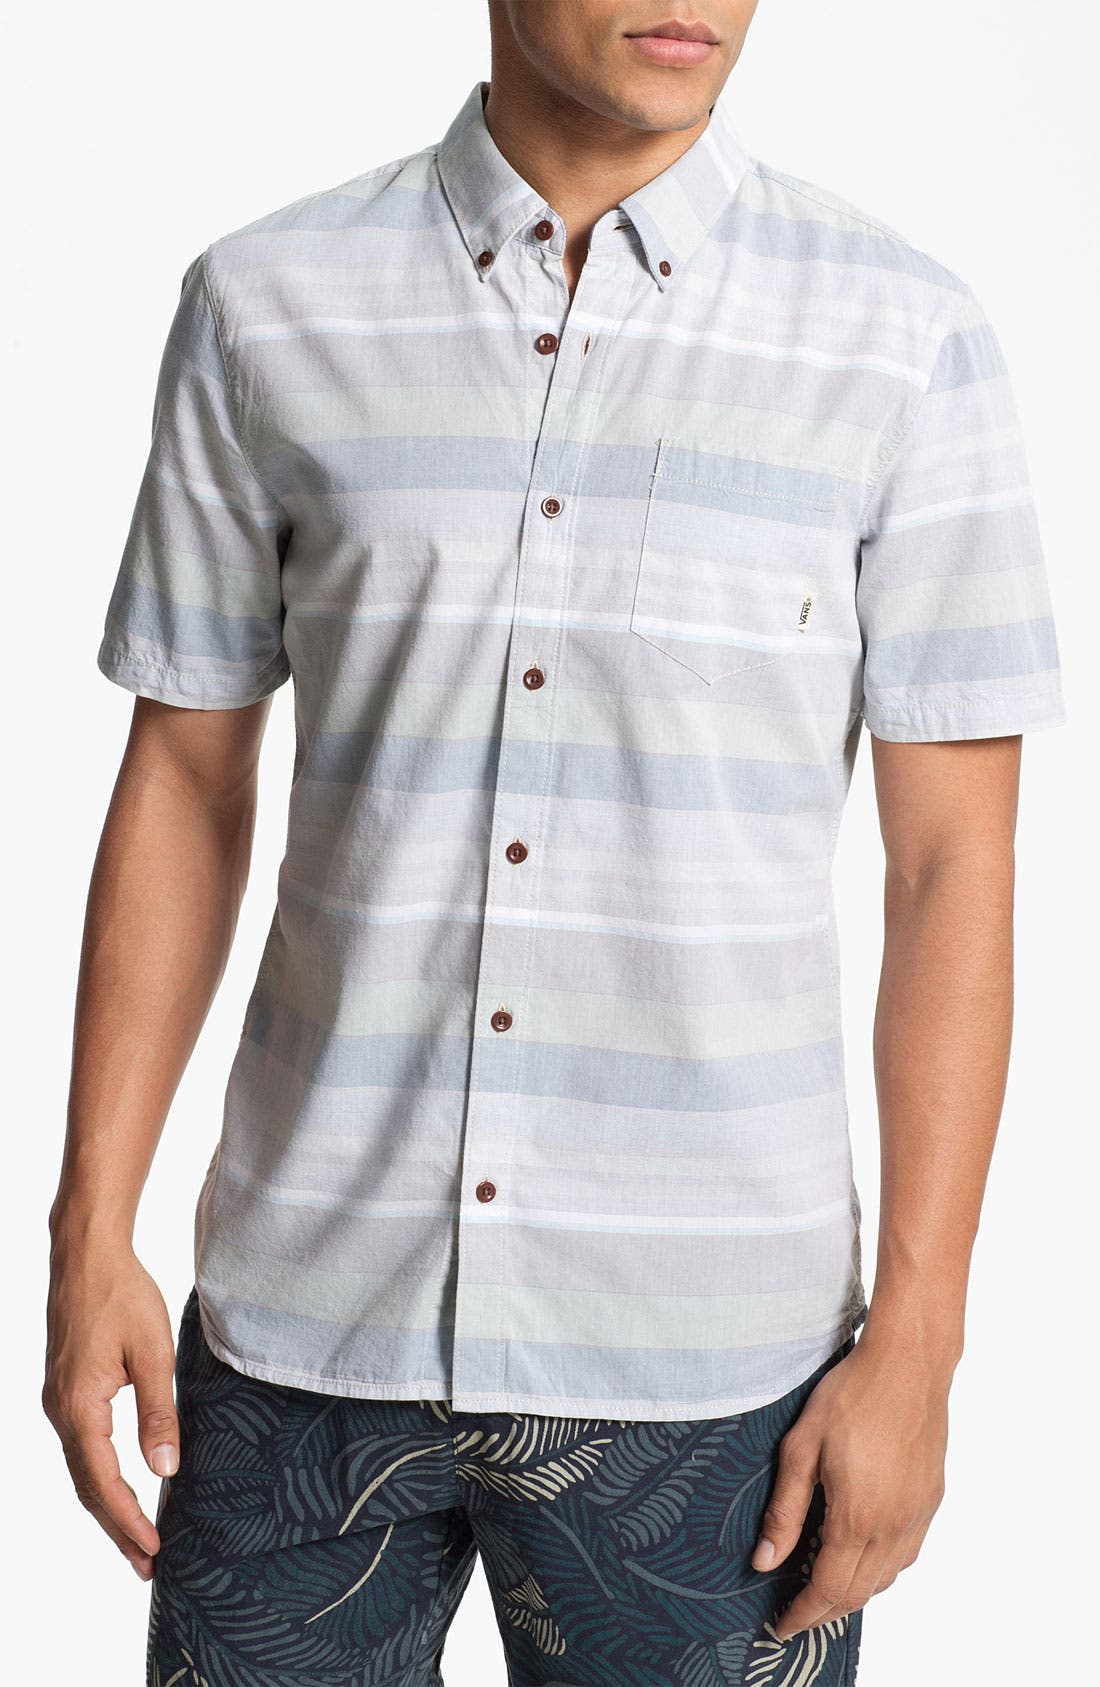 Main Image - Vans 'Wareham' Woven Shirt